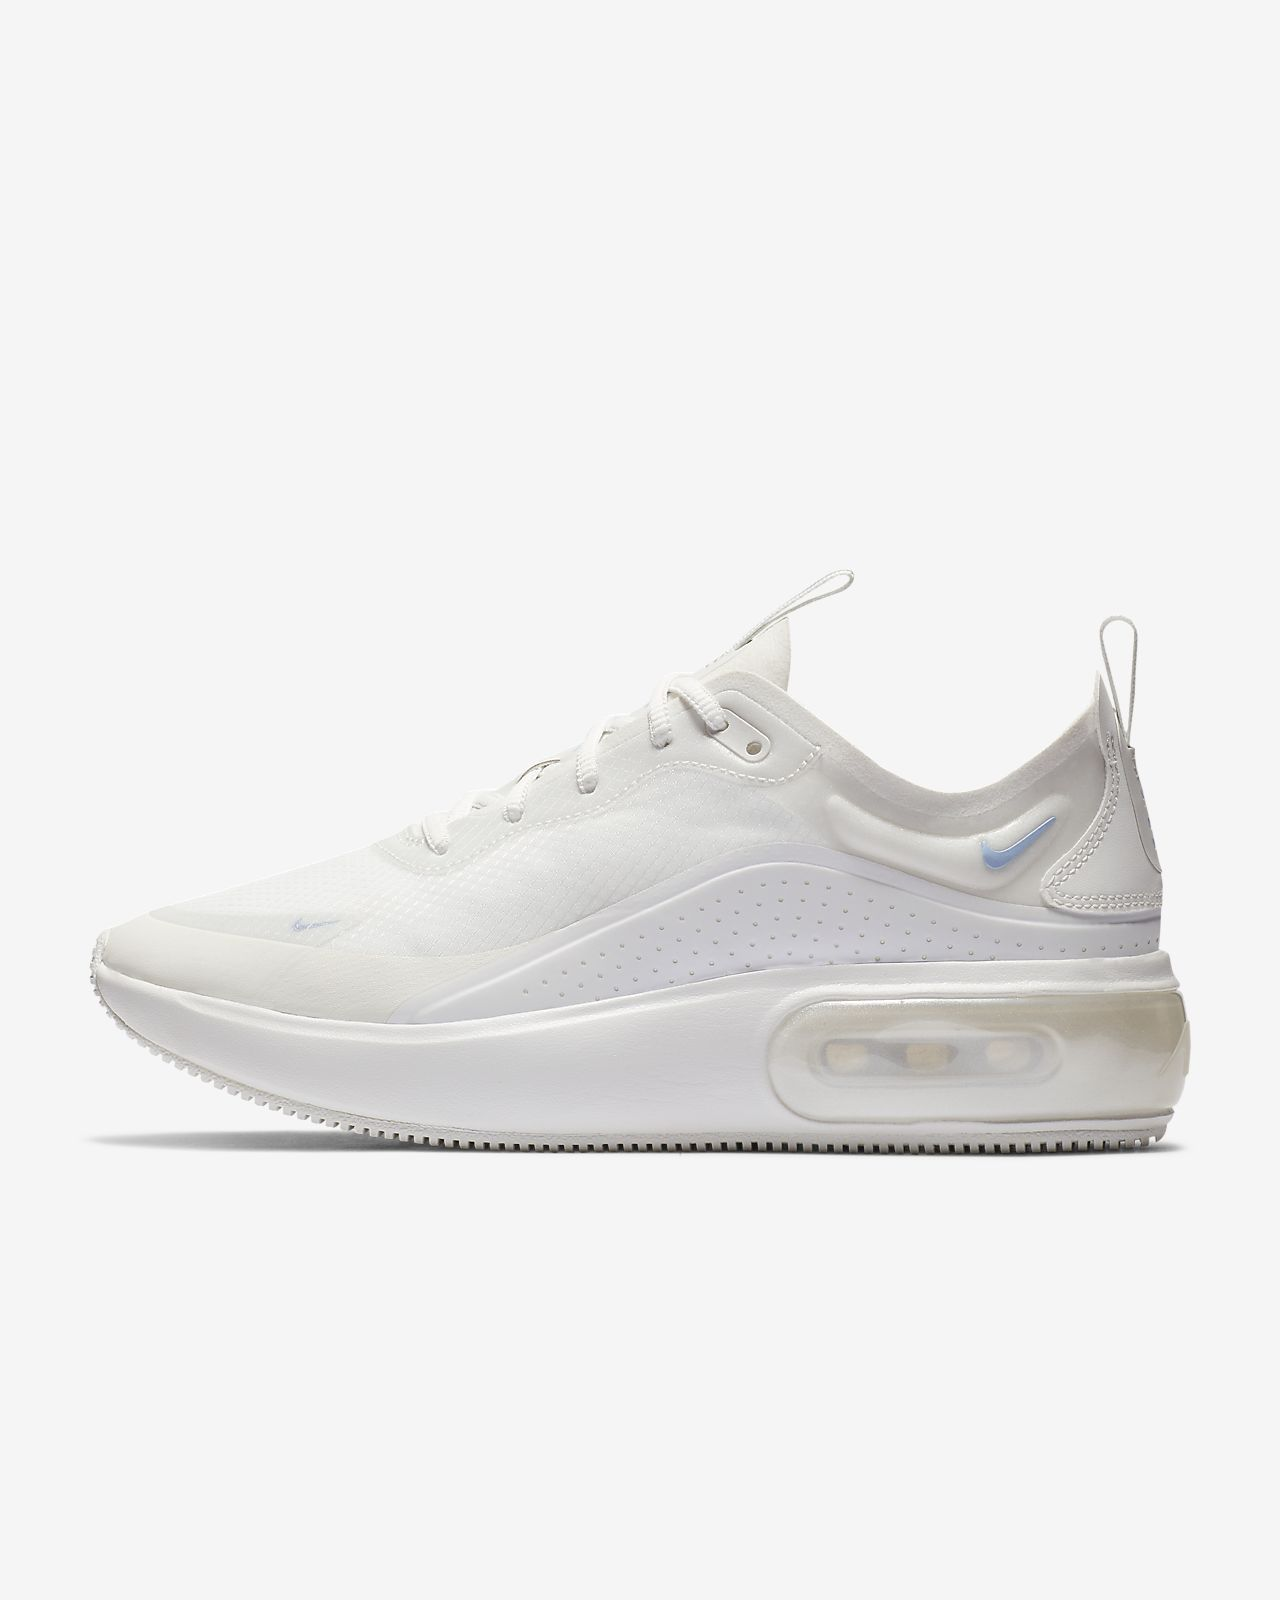 Nike Air Force 1 Low White Orange | CJ9699 100 | The Sole Womens